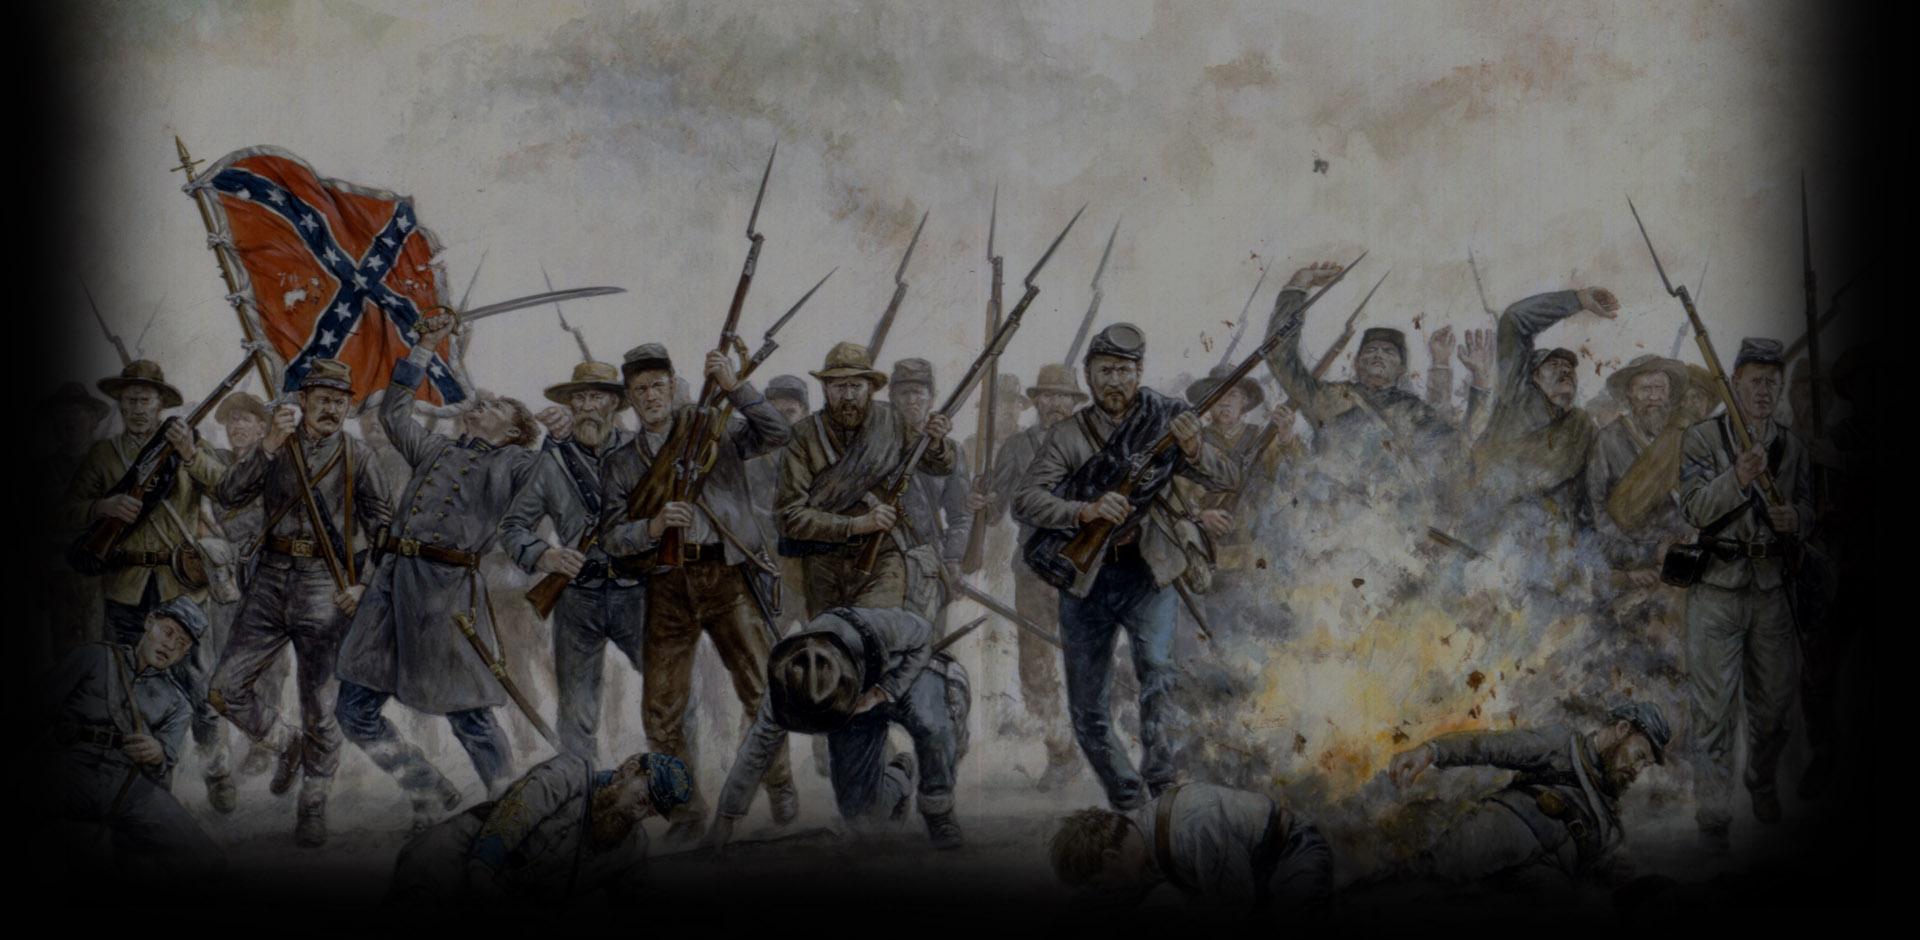 Image battleplan american civil war background the - American civil war wallpaper ...